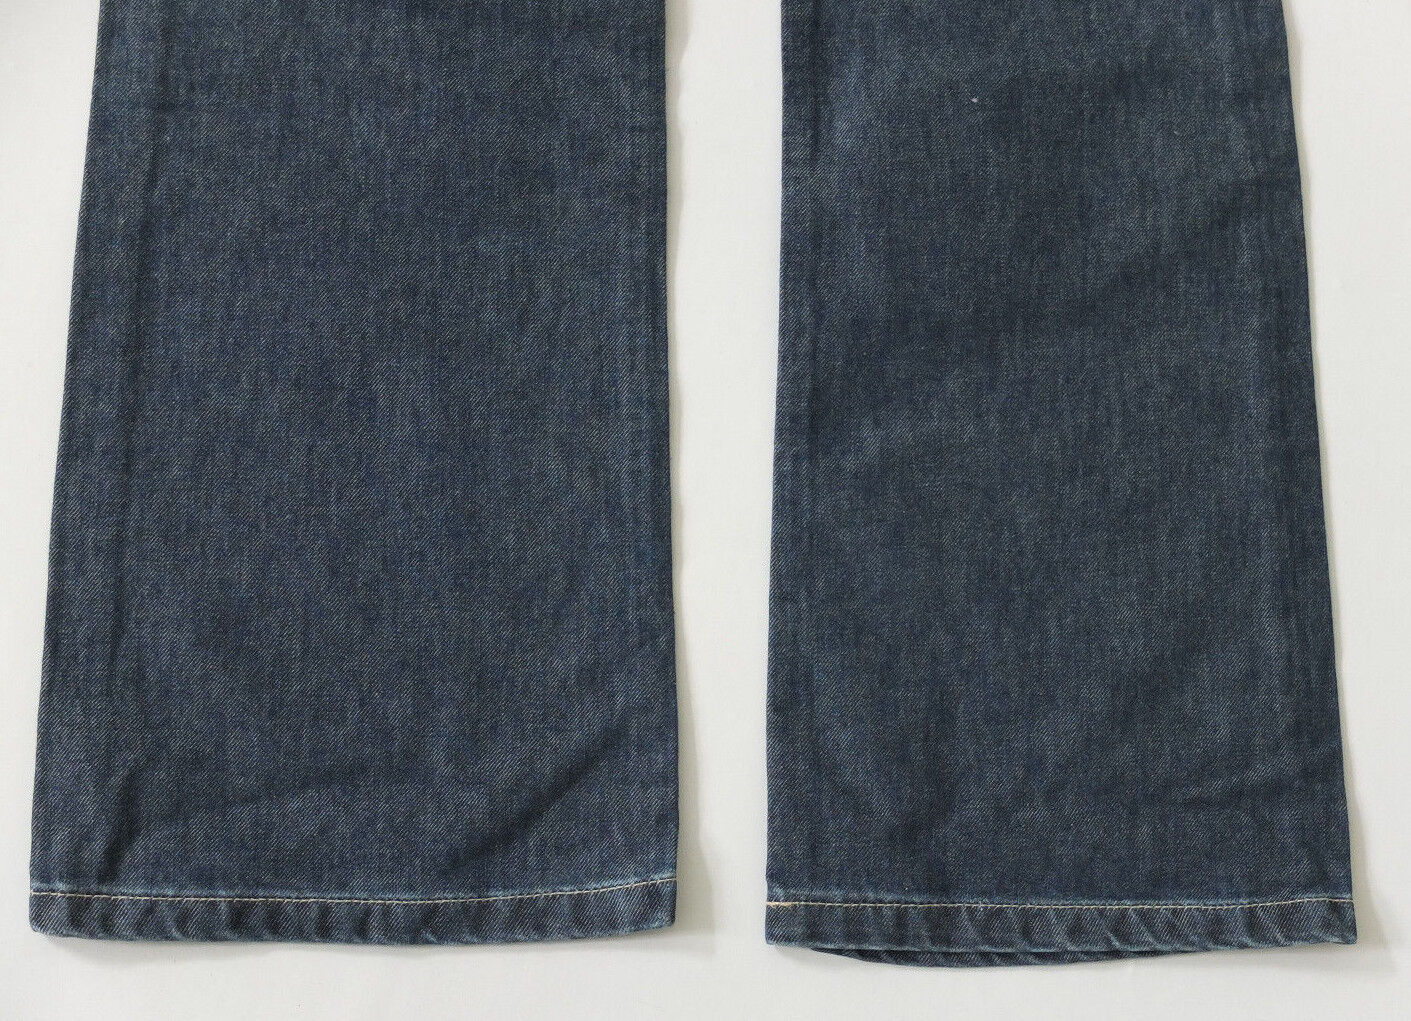 REPLAY geile Jeans Gr. W 28 NEU | Stabile Stabile Stabile Qualität  41d292